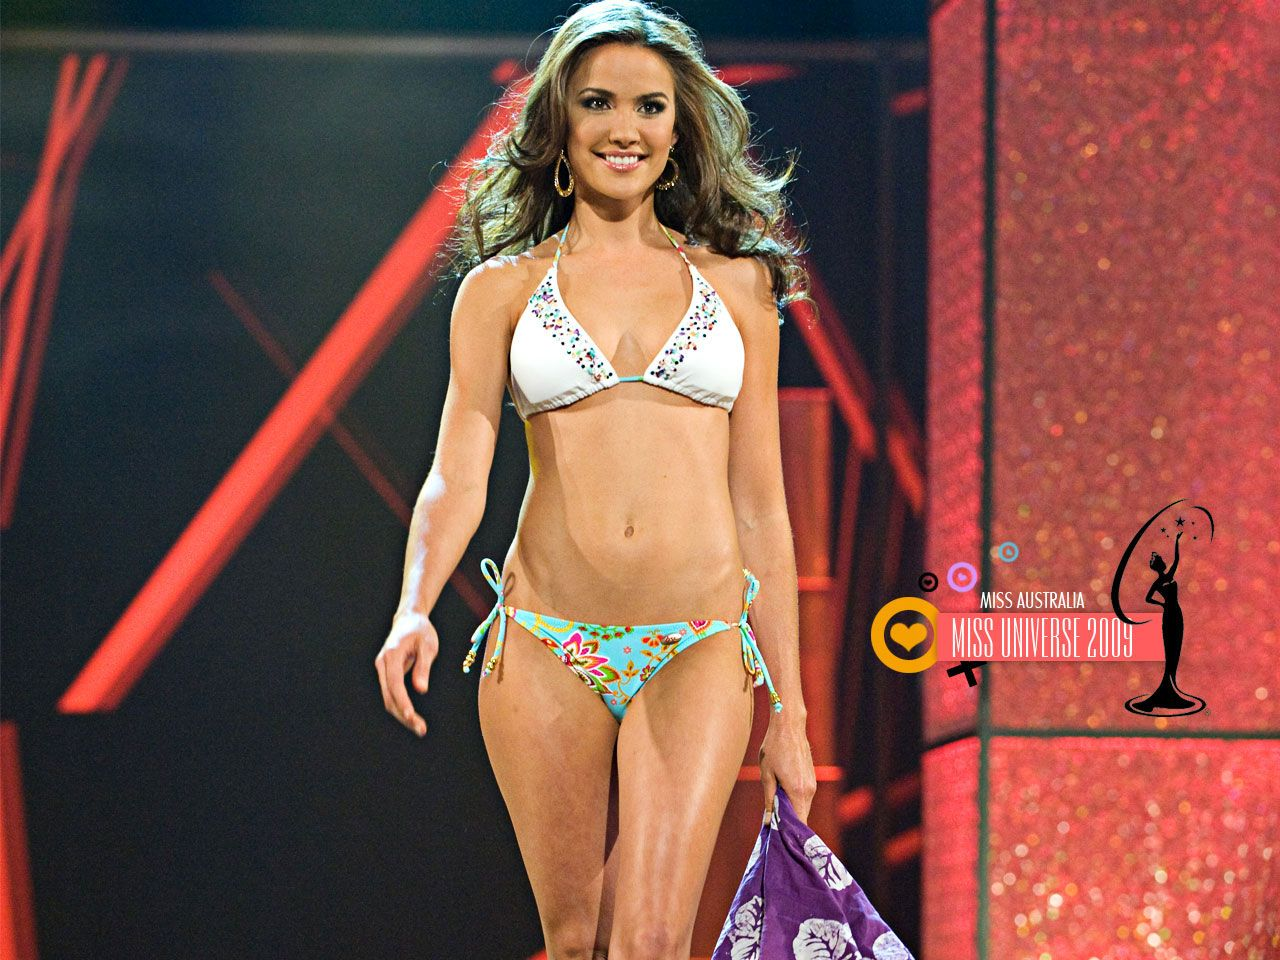 That interrupt miss bikini australia 2009 apologise, but